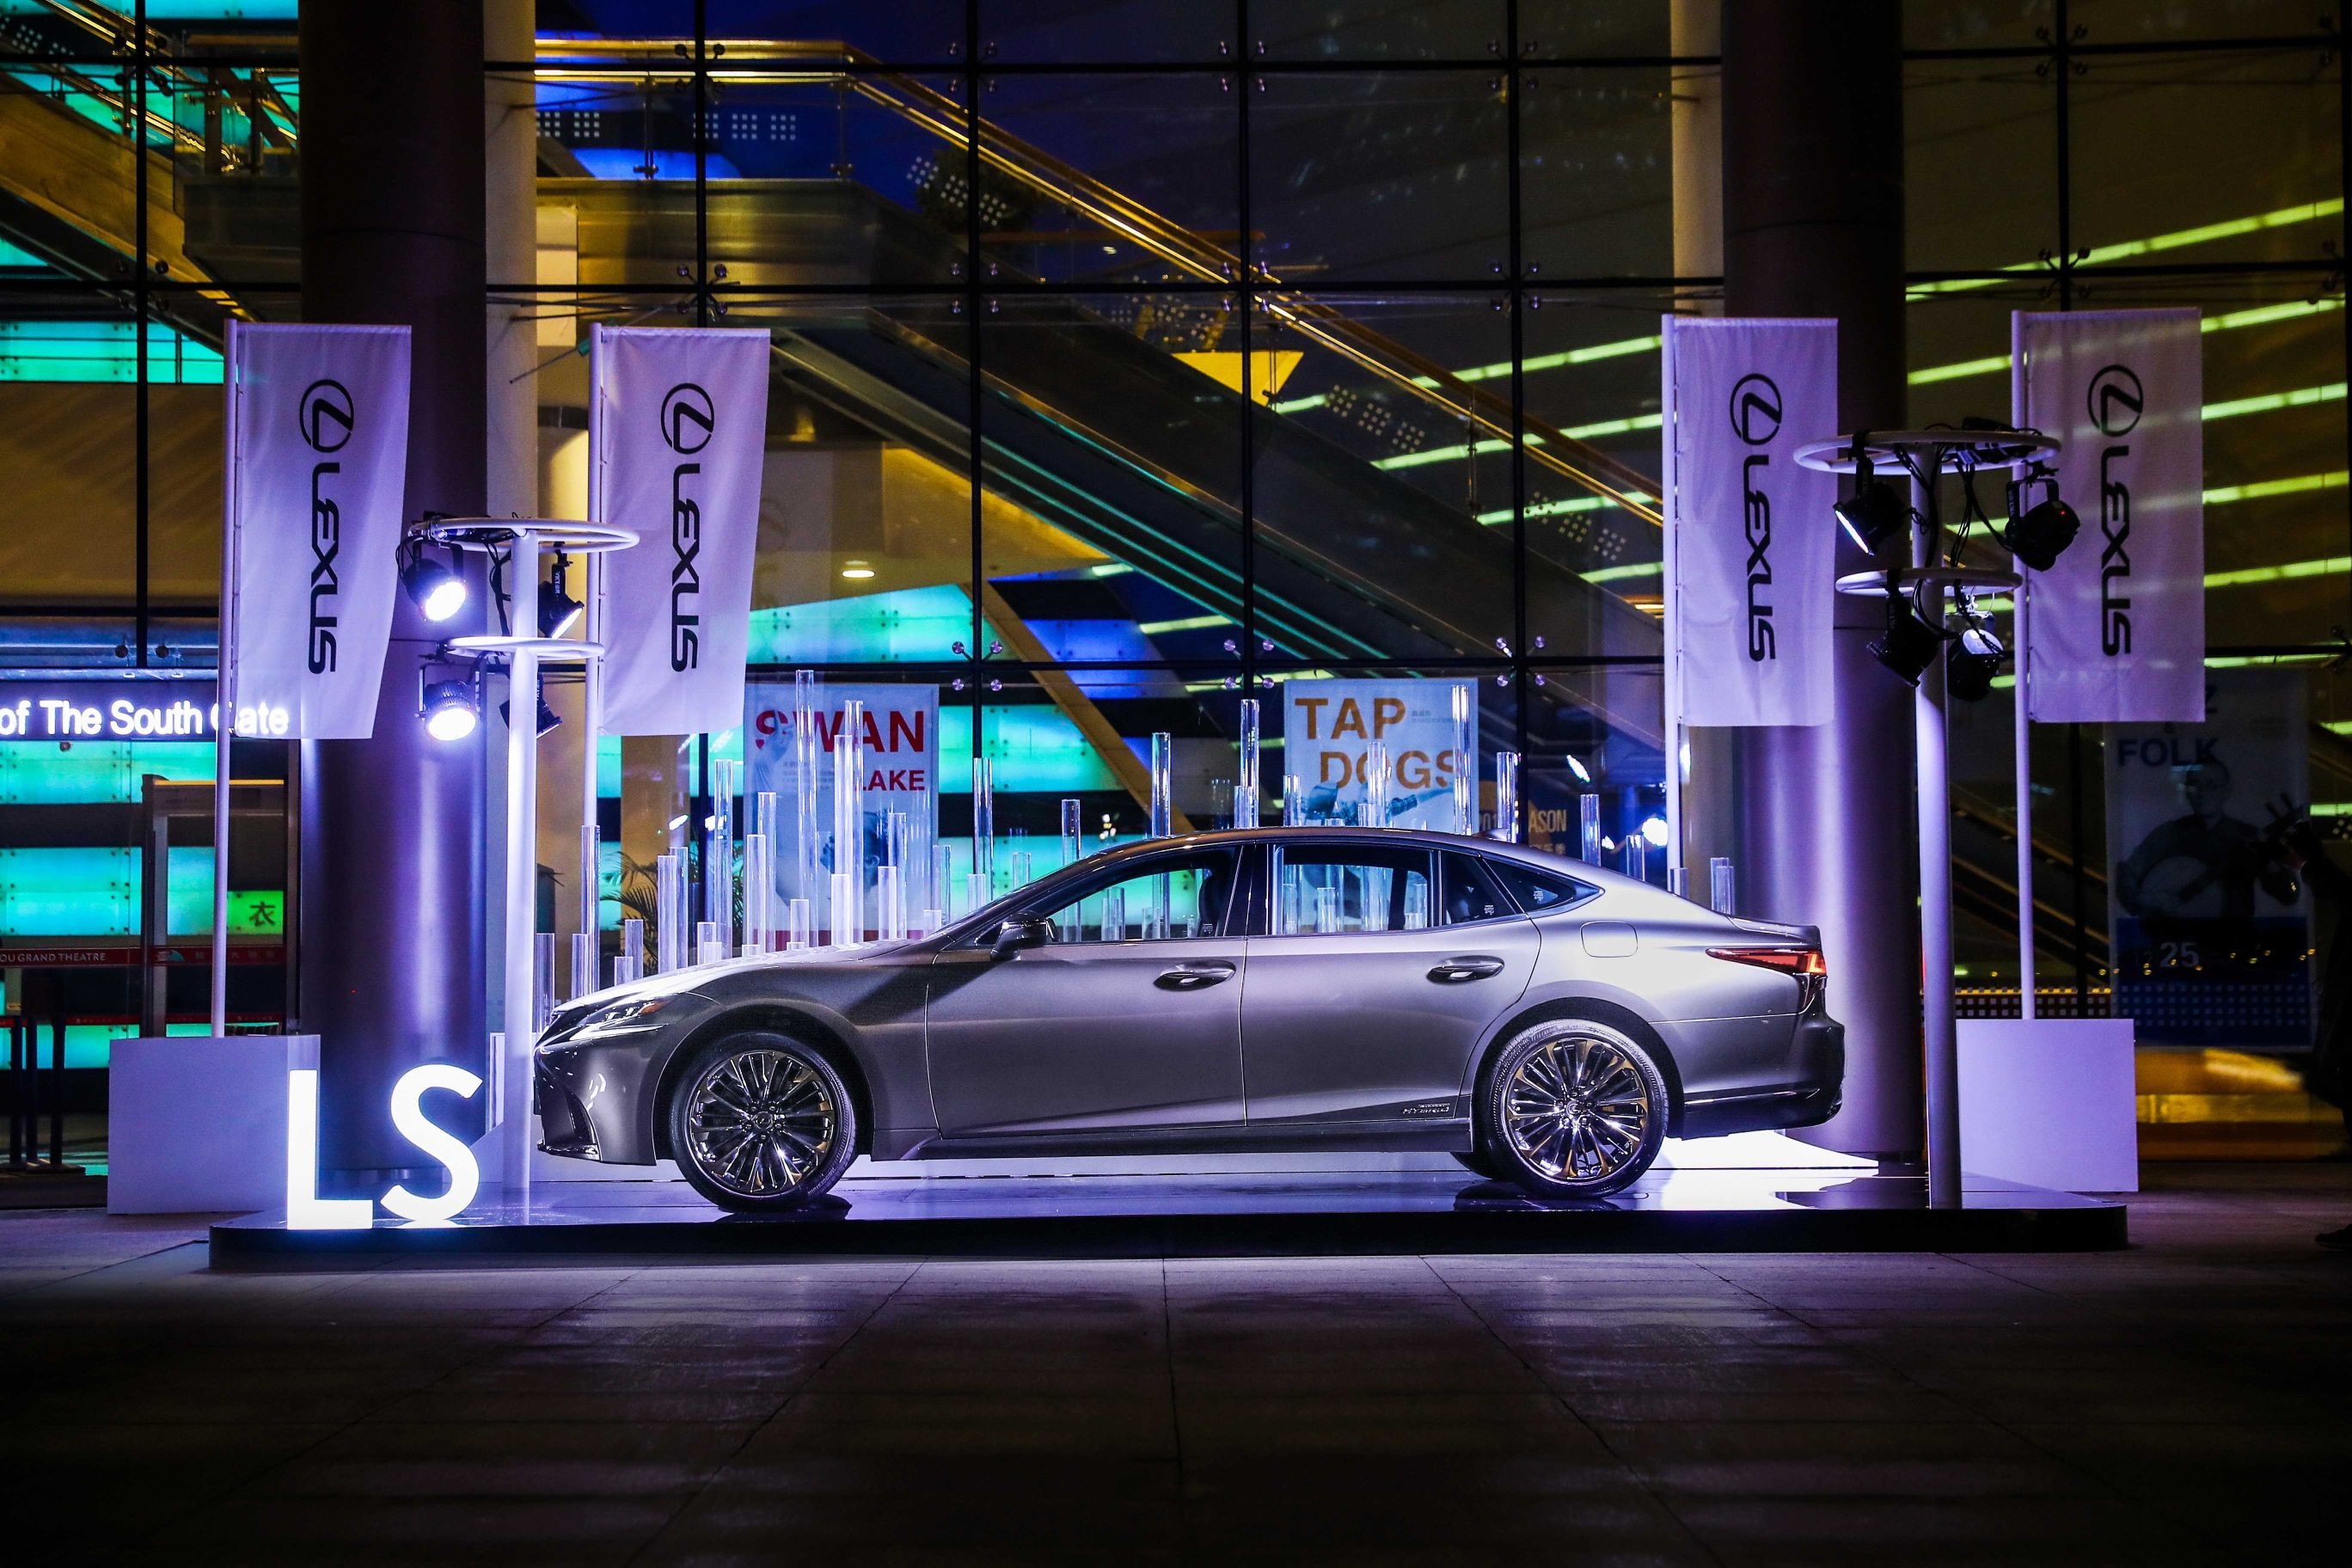 LEXUS雷克萨斯携手单向空间再度呈现Lexus Lab思想盛宴